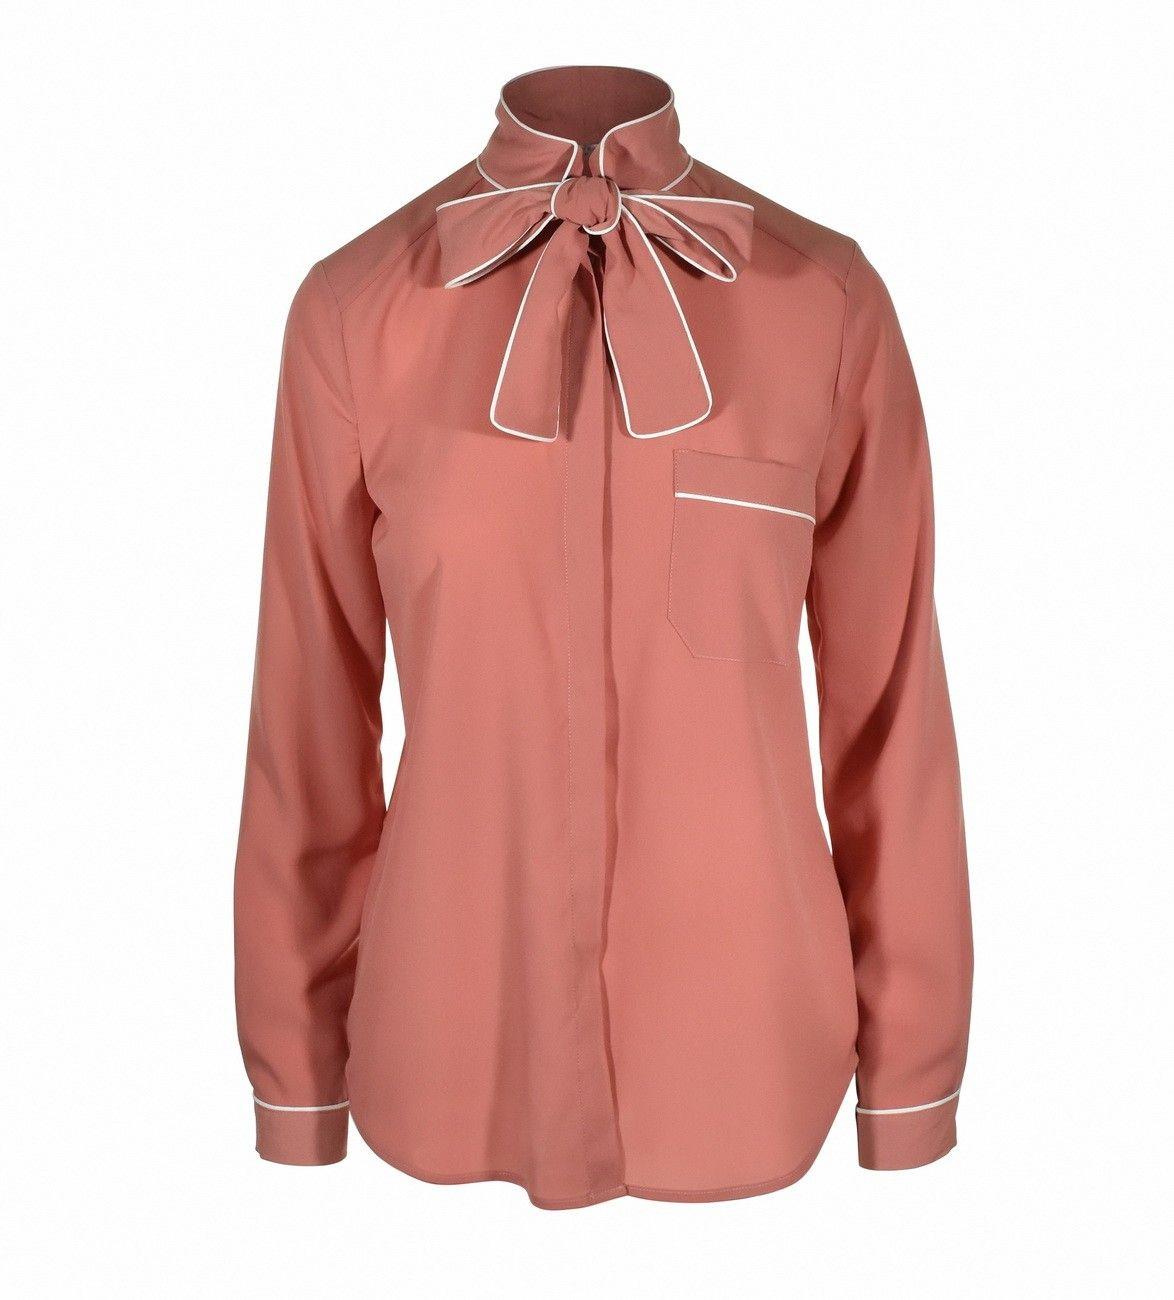 BEATRICE B. - Damen Bluse - Blouse 4294 Fabric - Powder